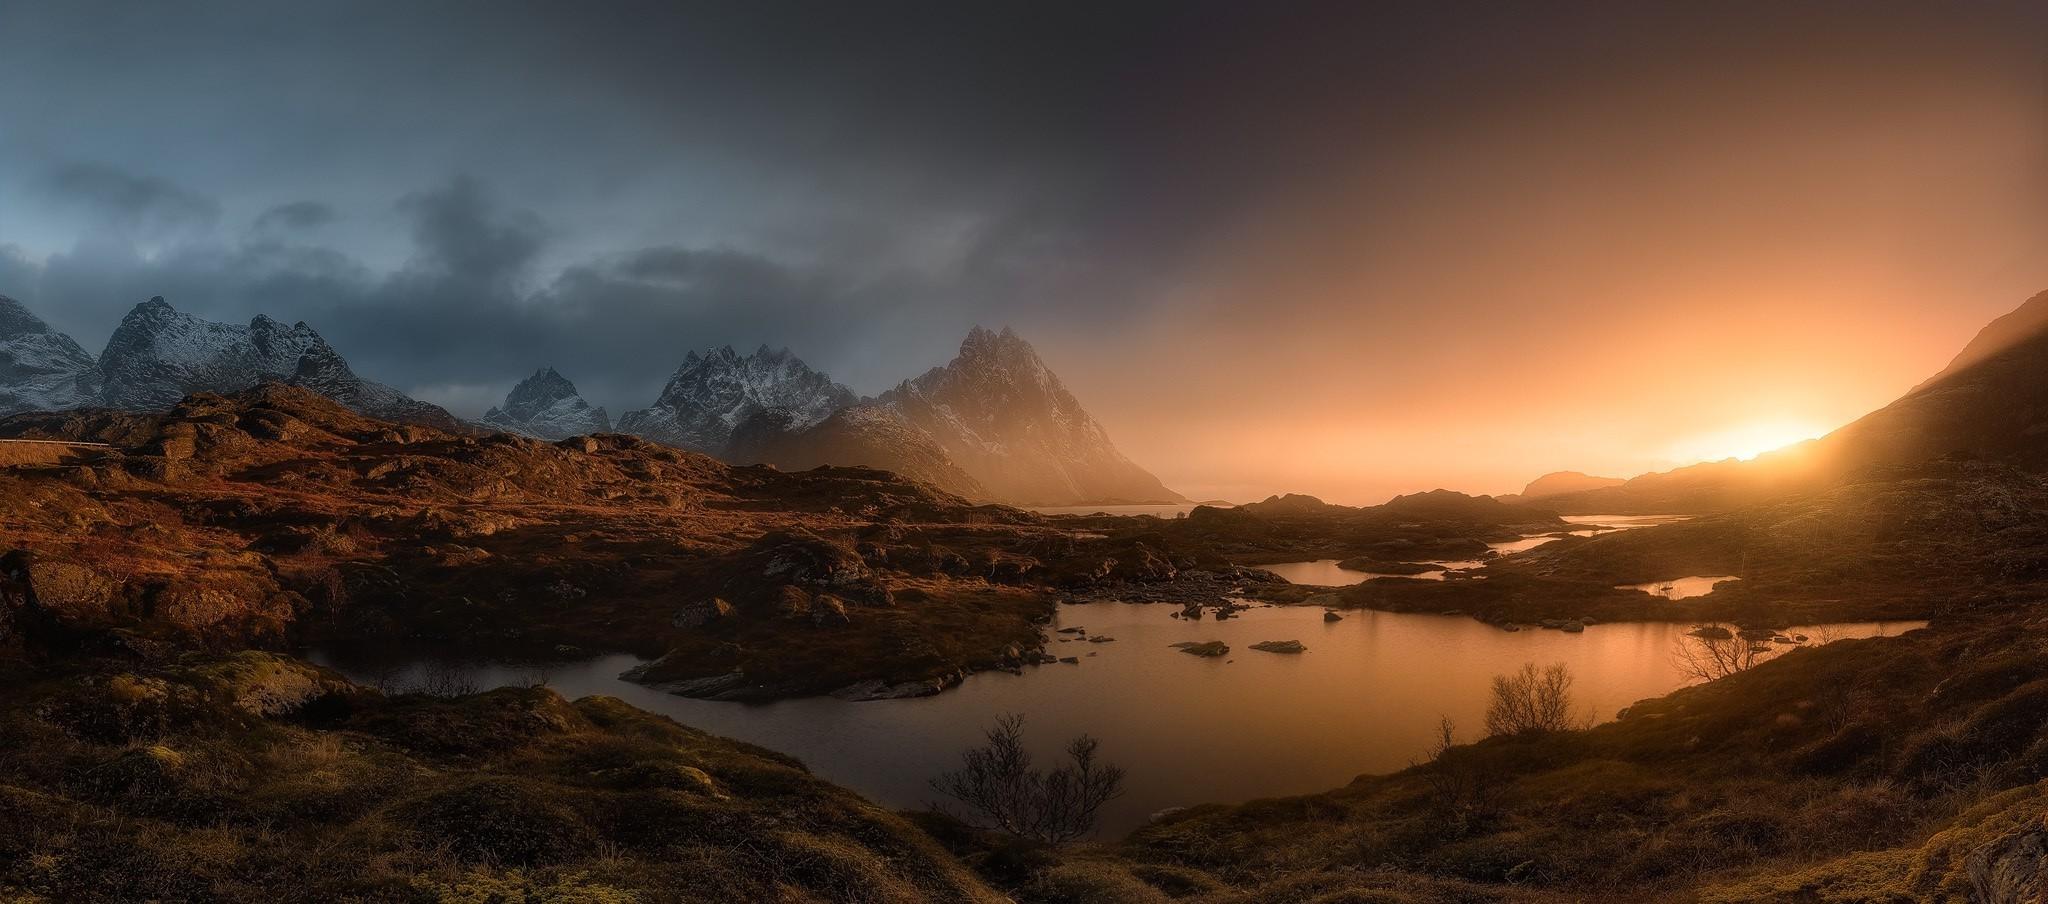 2048x904 Px Clouds Landscape Lofoten Islands Mist Mountain Nature Norway Panoramas Pond Shrubs Snowy Peak Sunrise